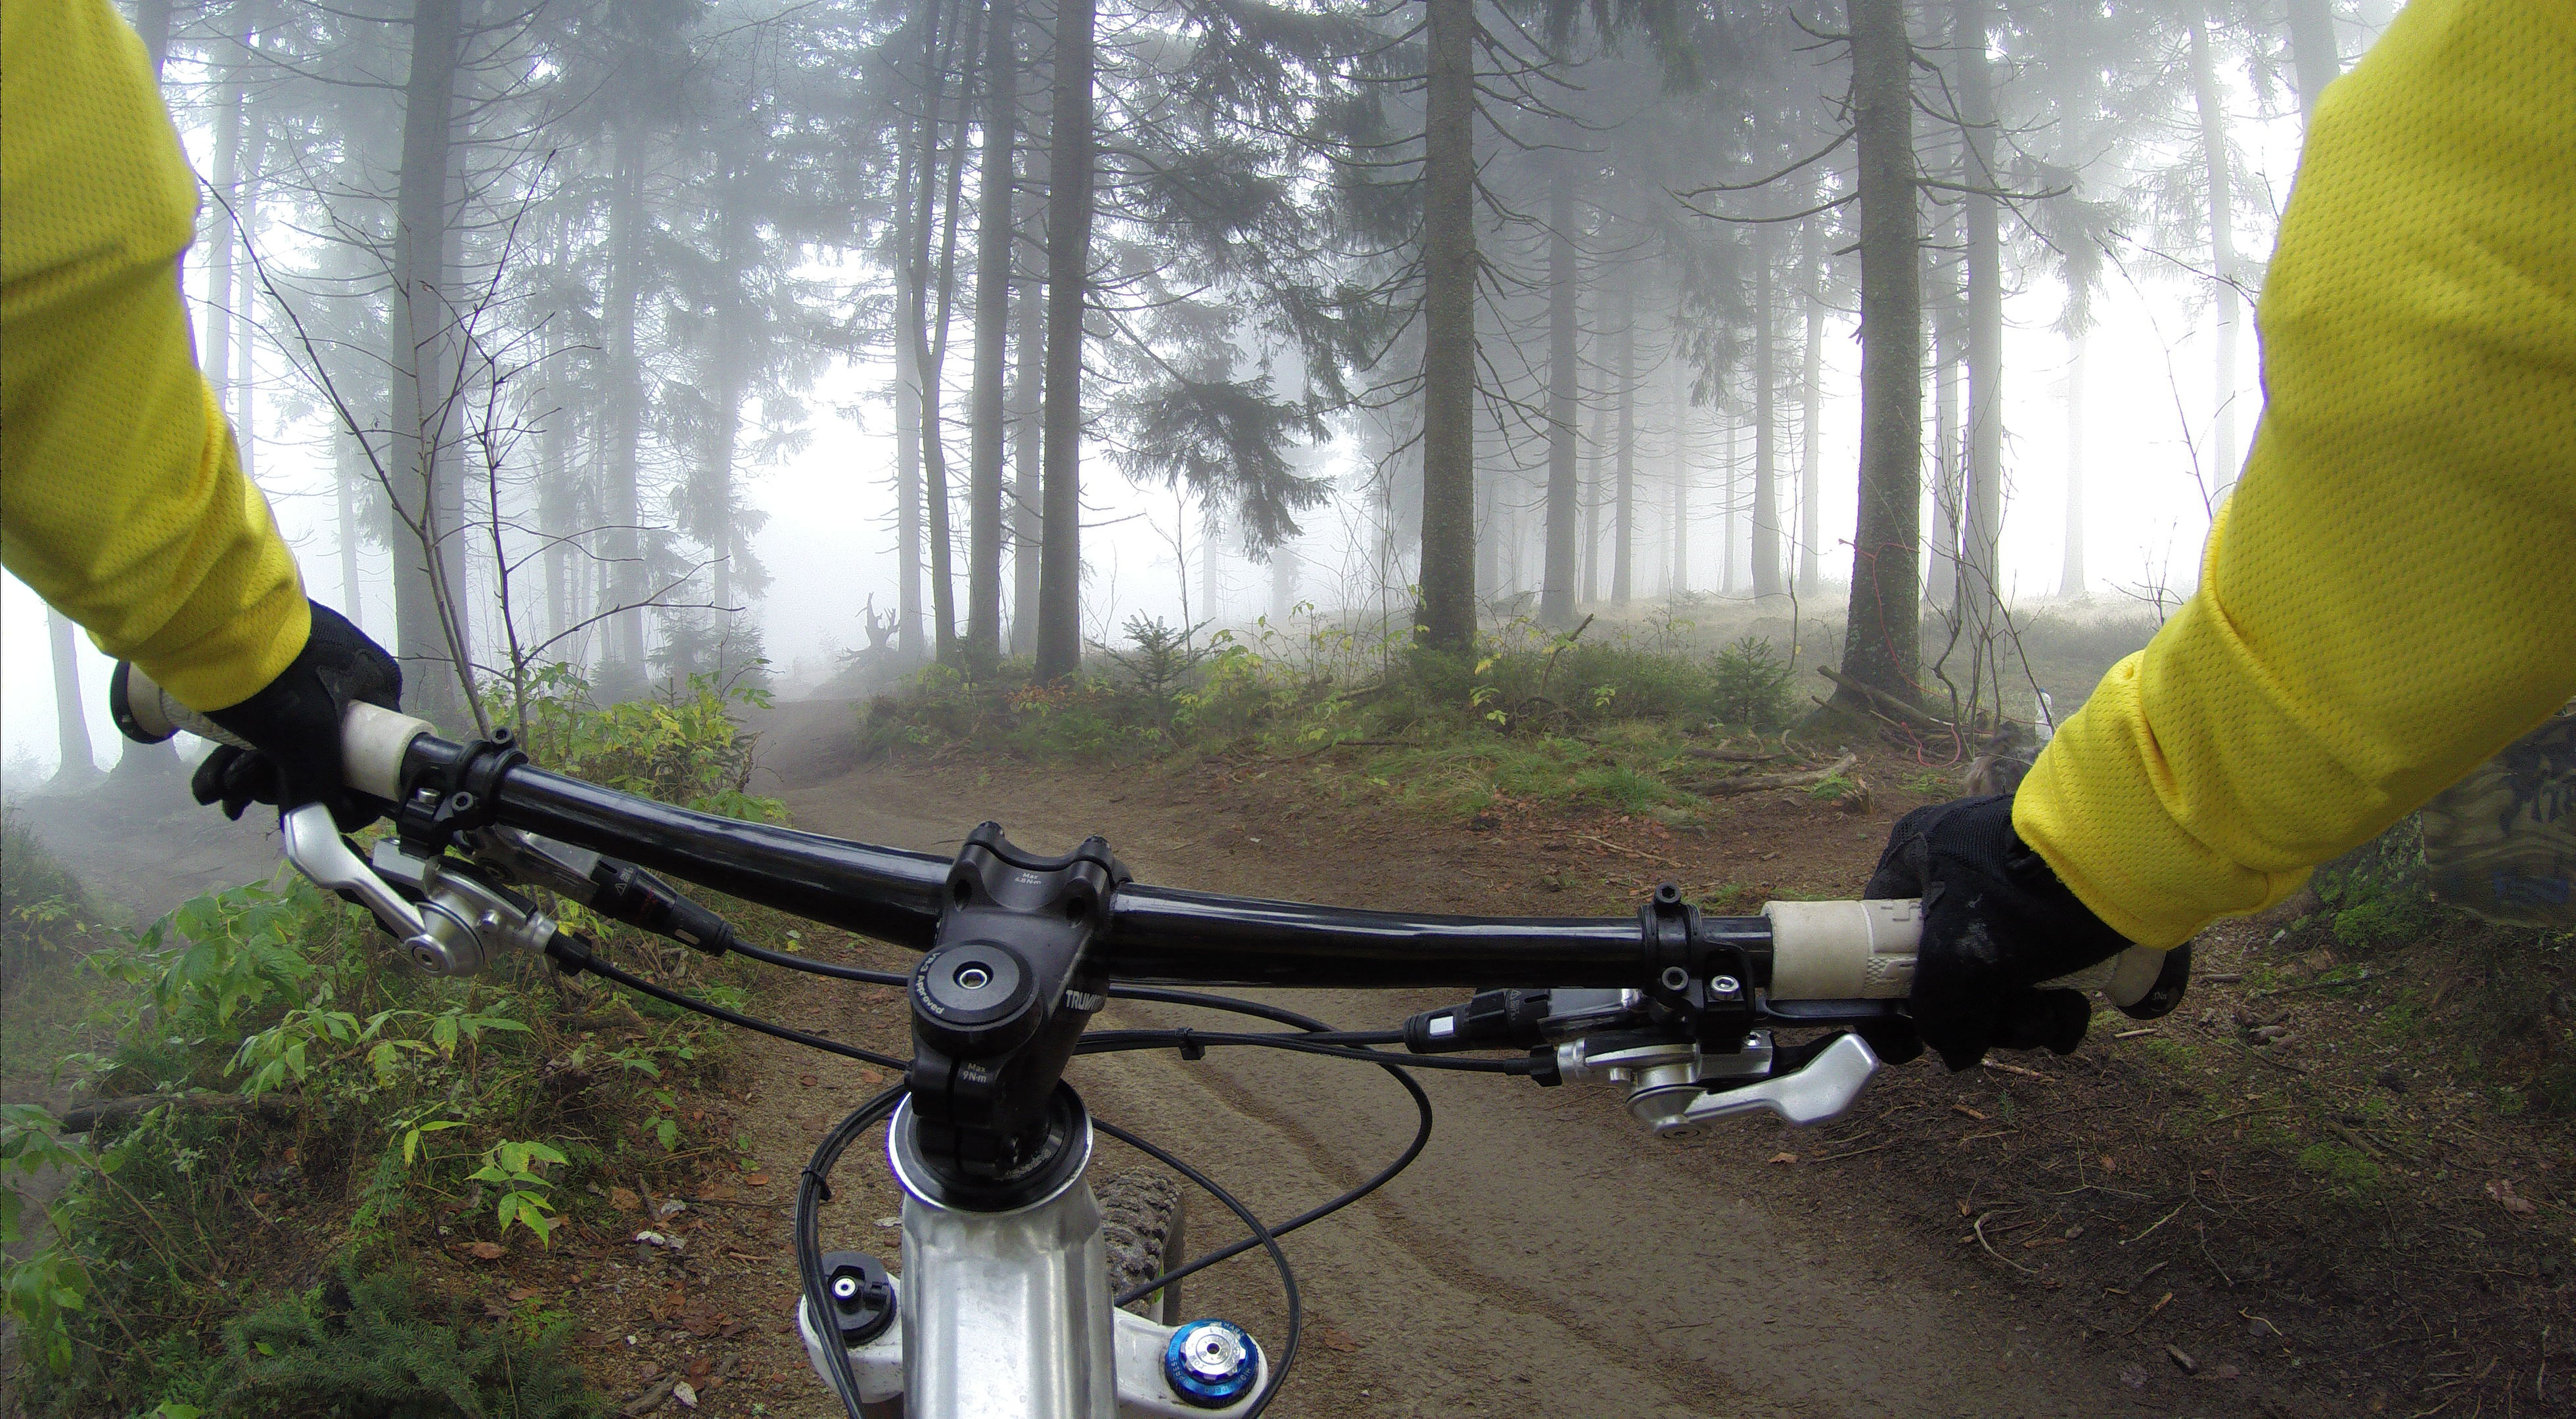 Speed, Adventure, Bike, Biker, Cycle, HQ Photo